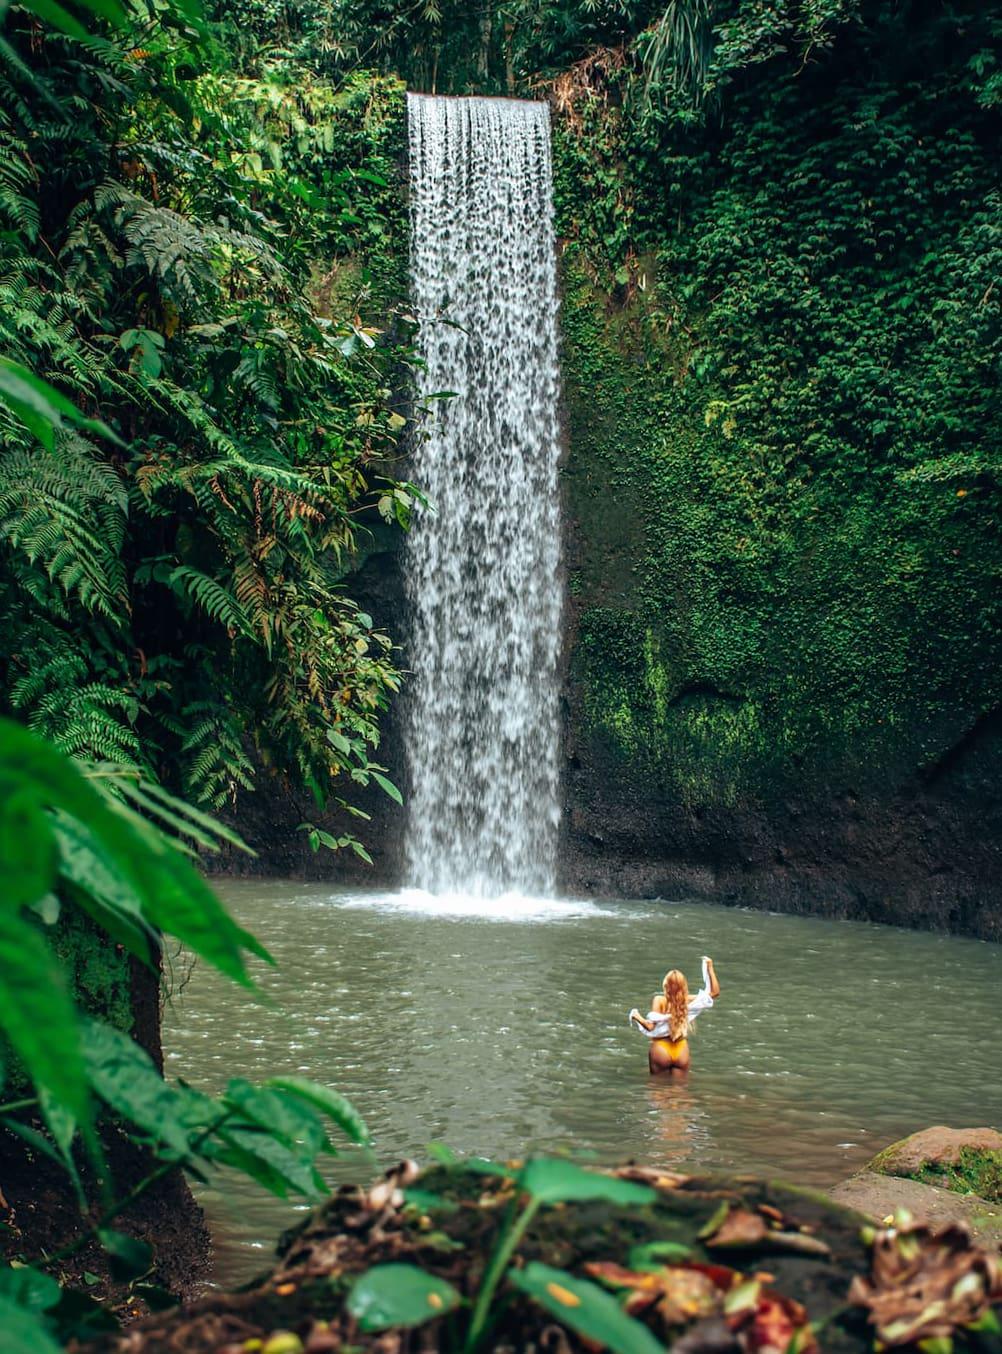 A guide to all the best waterfalls in Ubud Bali - Tibumana Waterfall